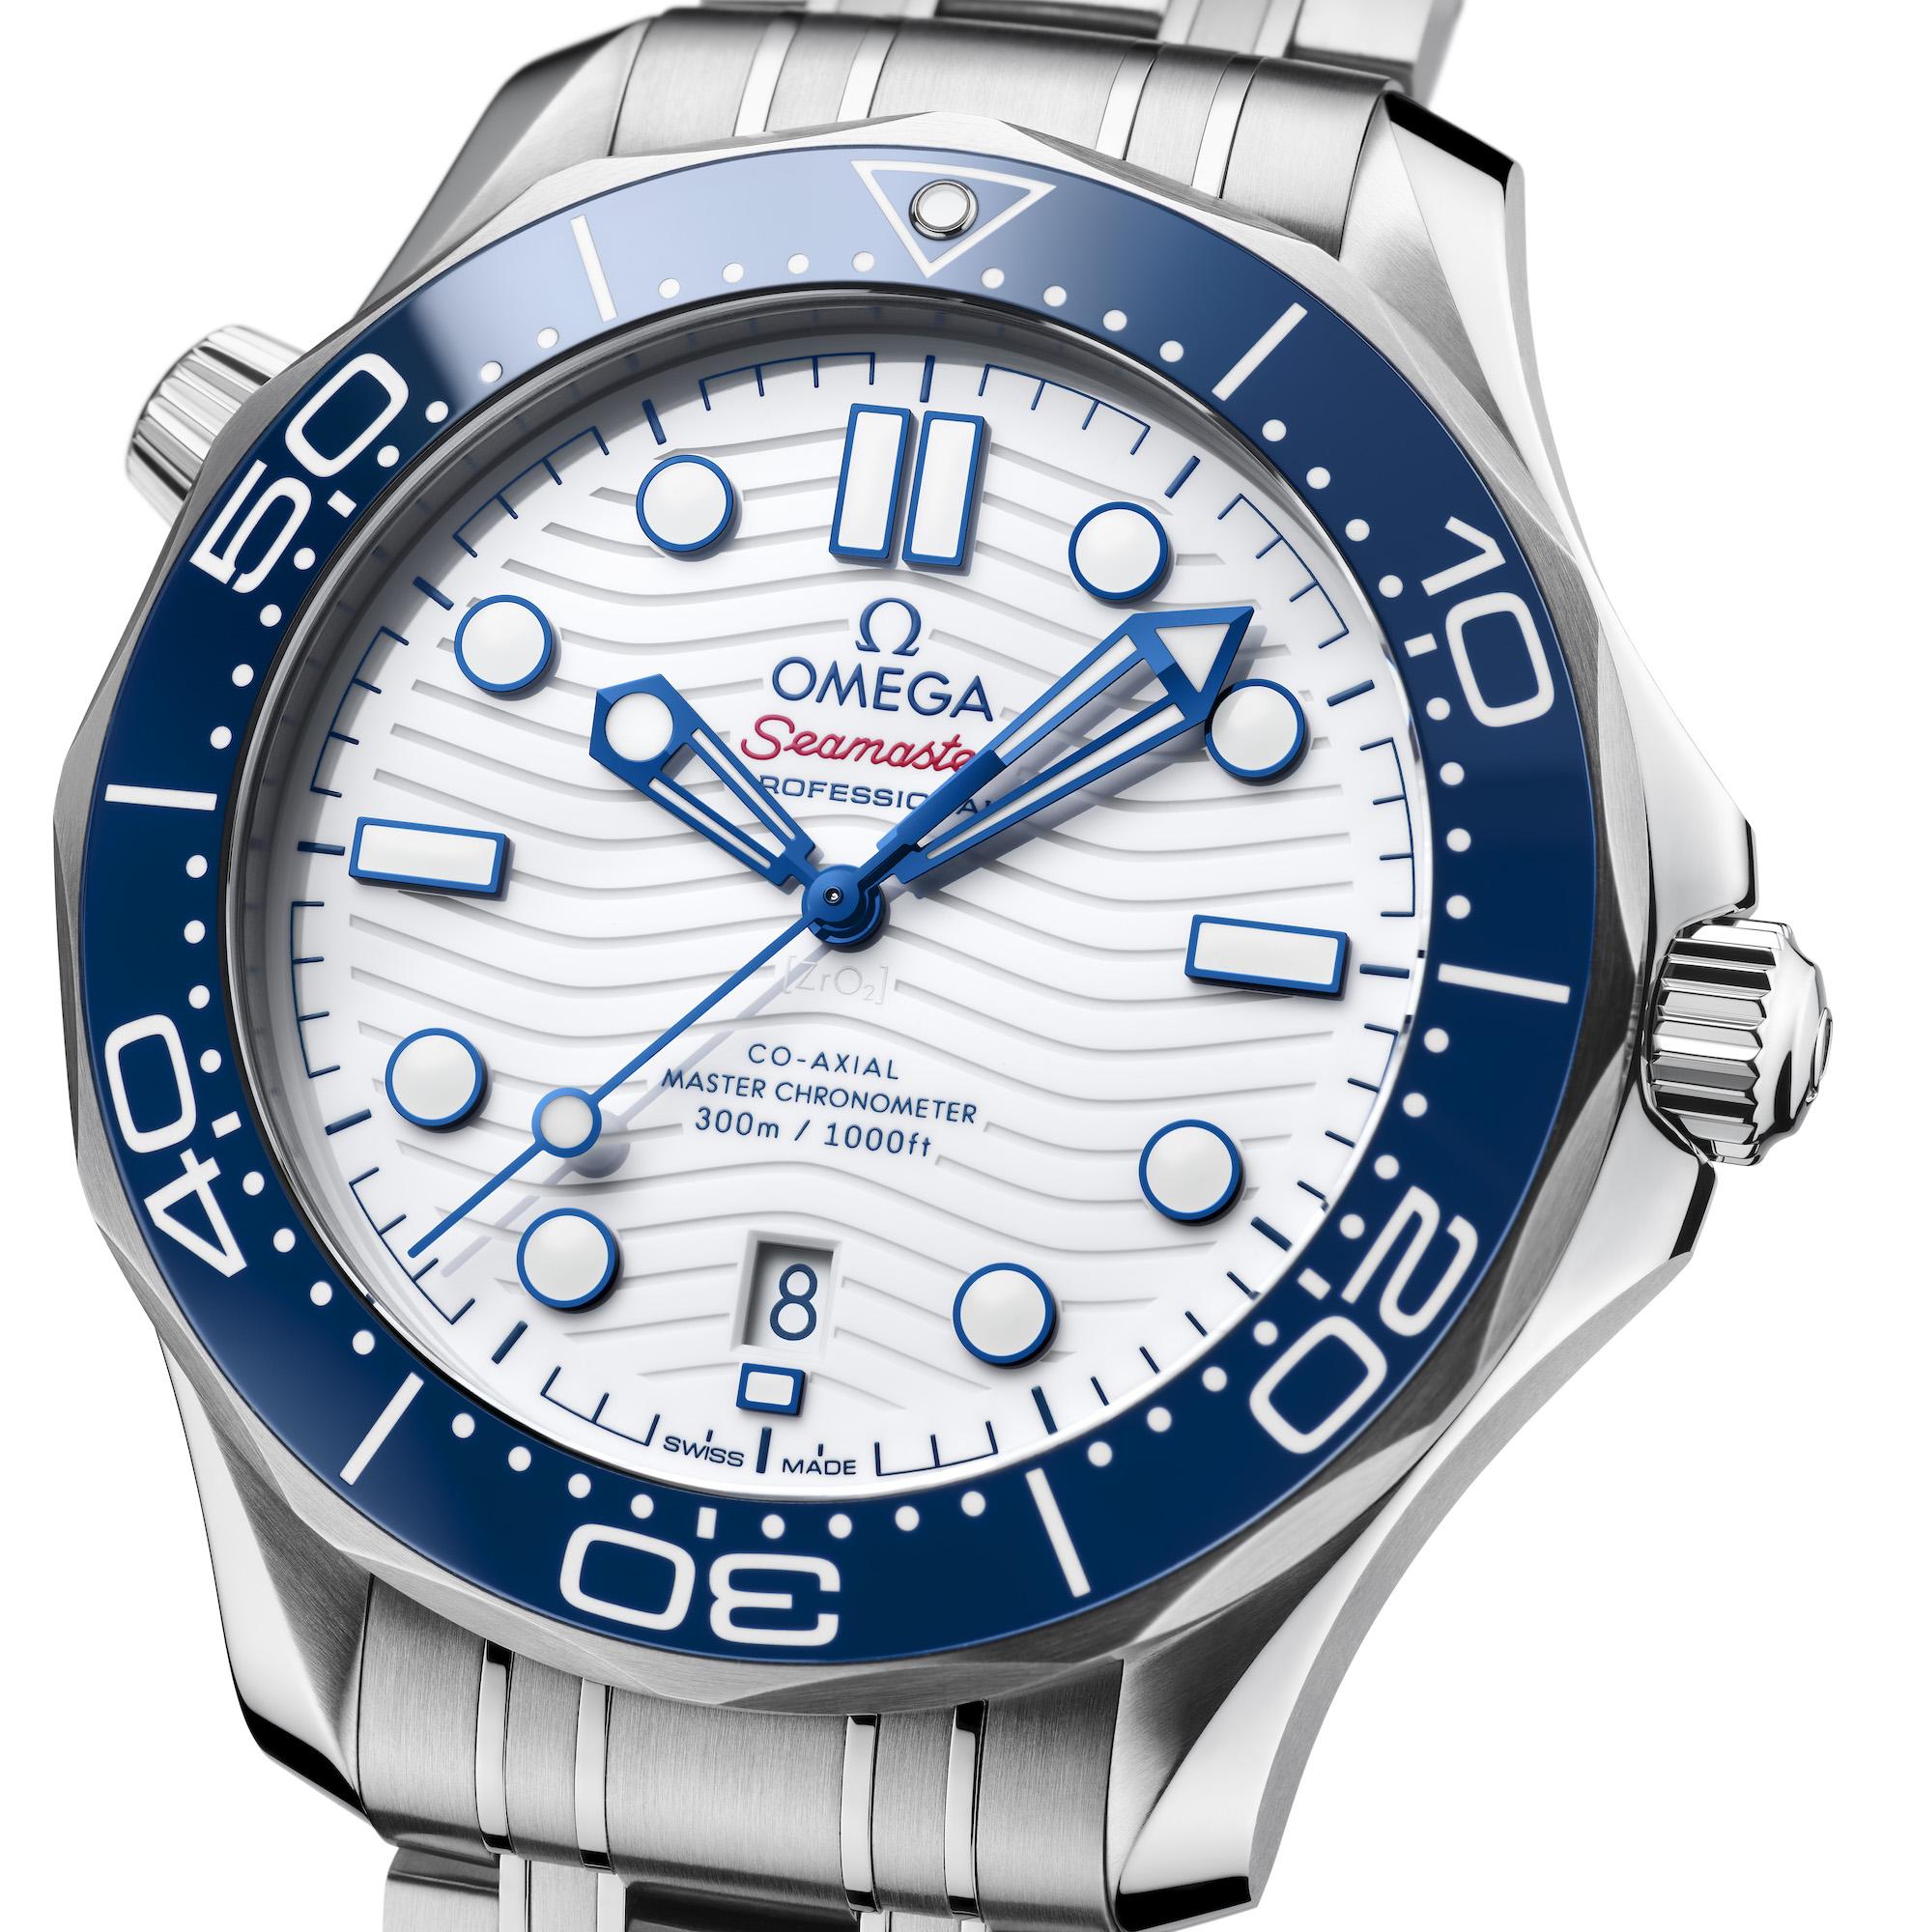 Omega Seamaster Diver 300M Tokyo 2020 522.30.42.20.04.001 Detalle esfera